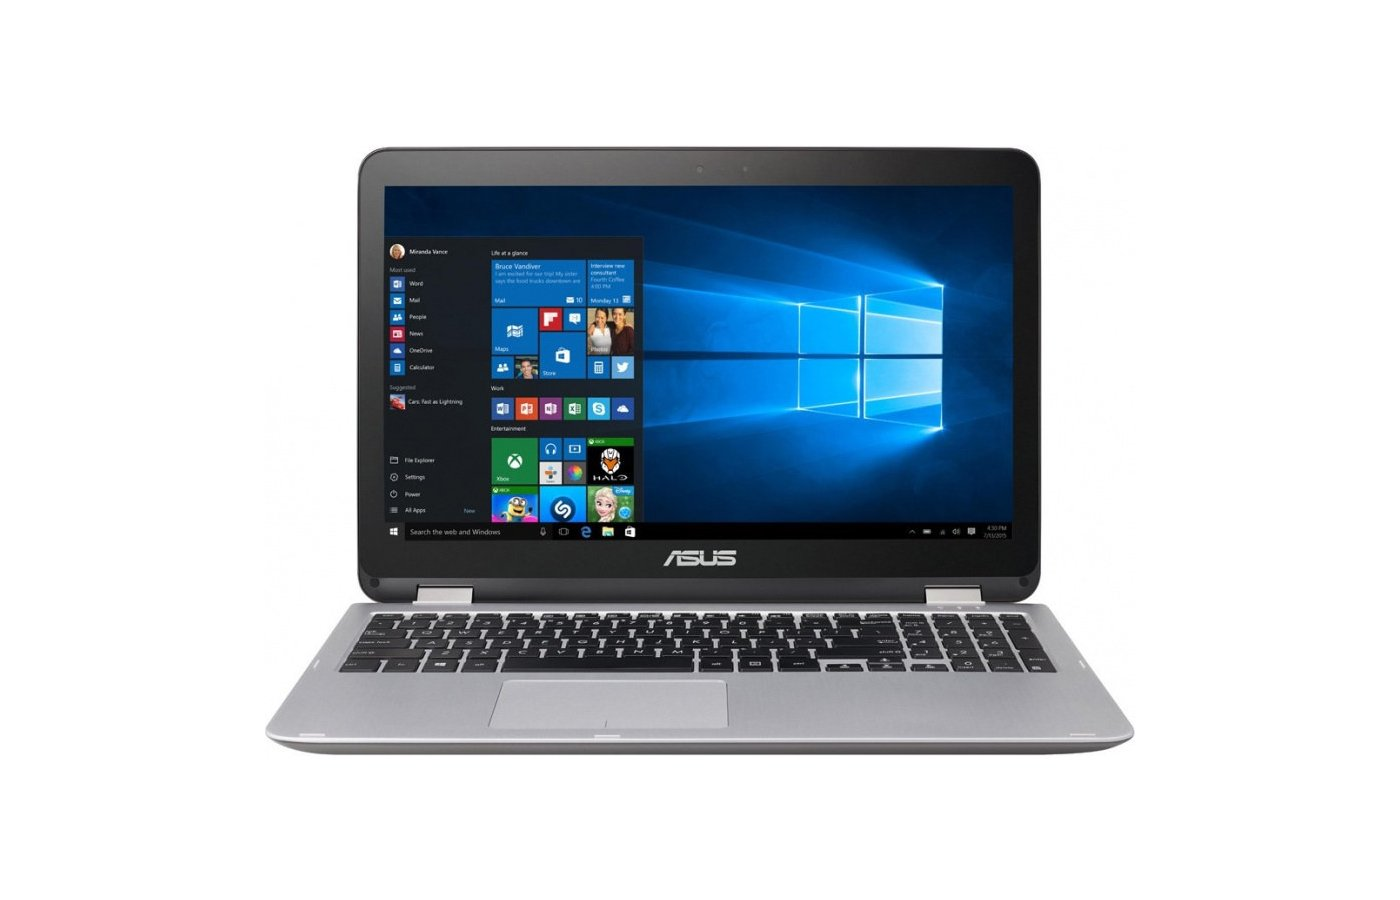 Ноутбук ASUS TP501UQ-DN035T Transformer /90NB0CV1-M00790/ i7 6500U/8Gb/1Tb/GTX 940M 2Gb/15.6FHD/Touch/Win10